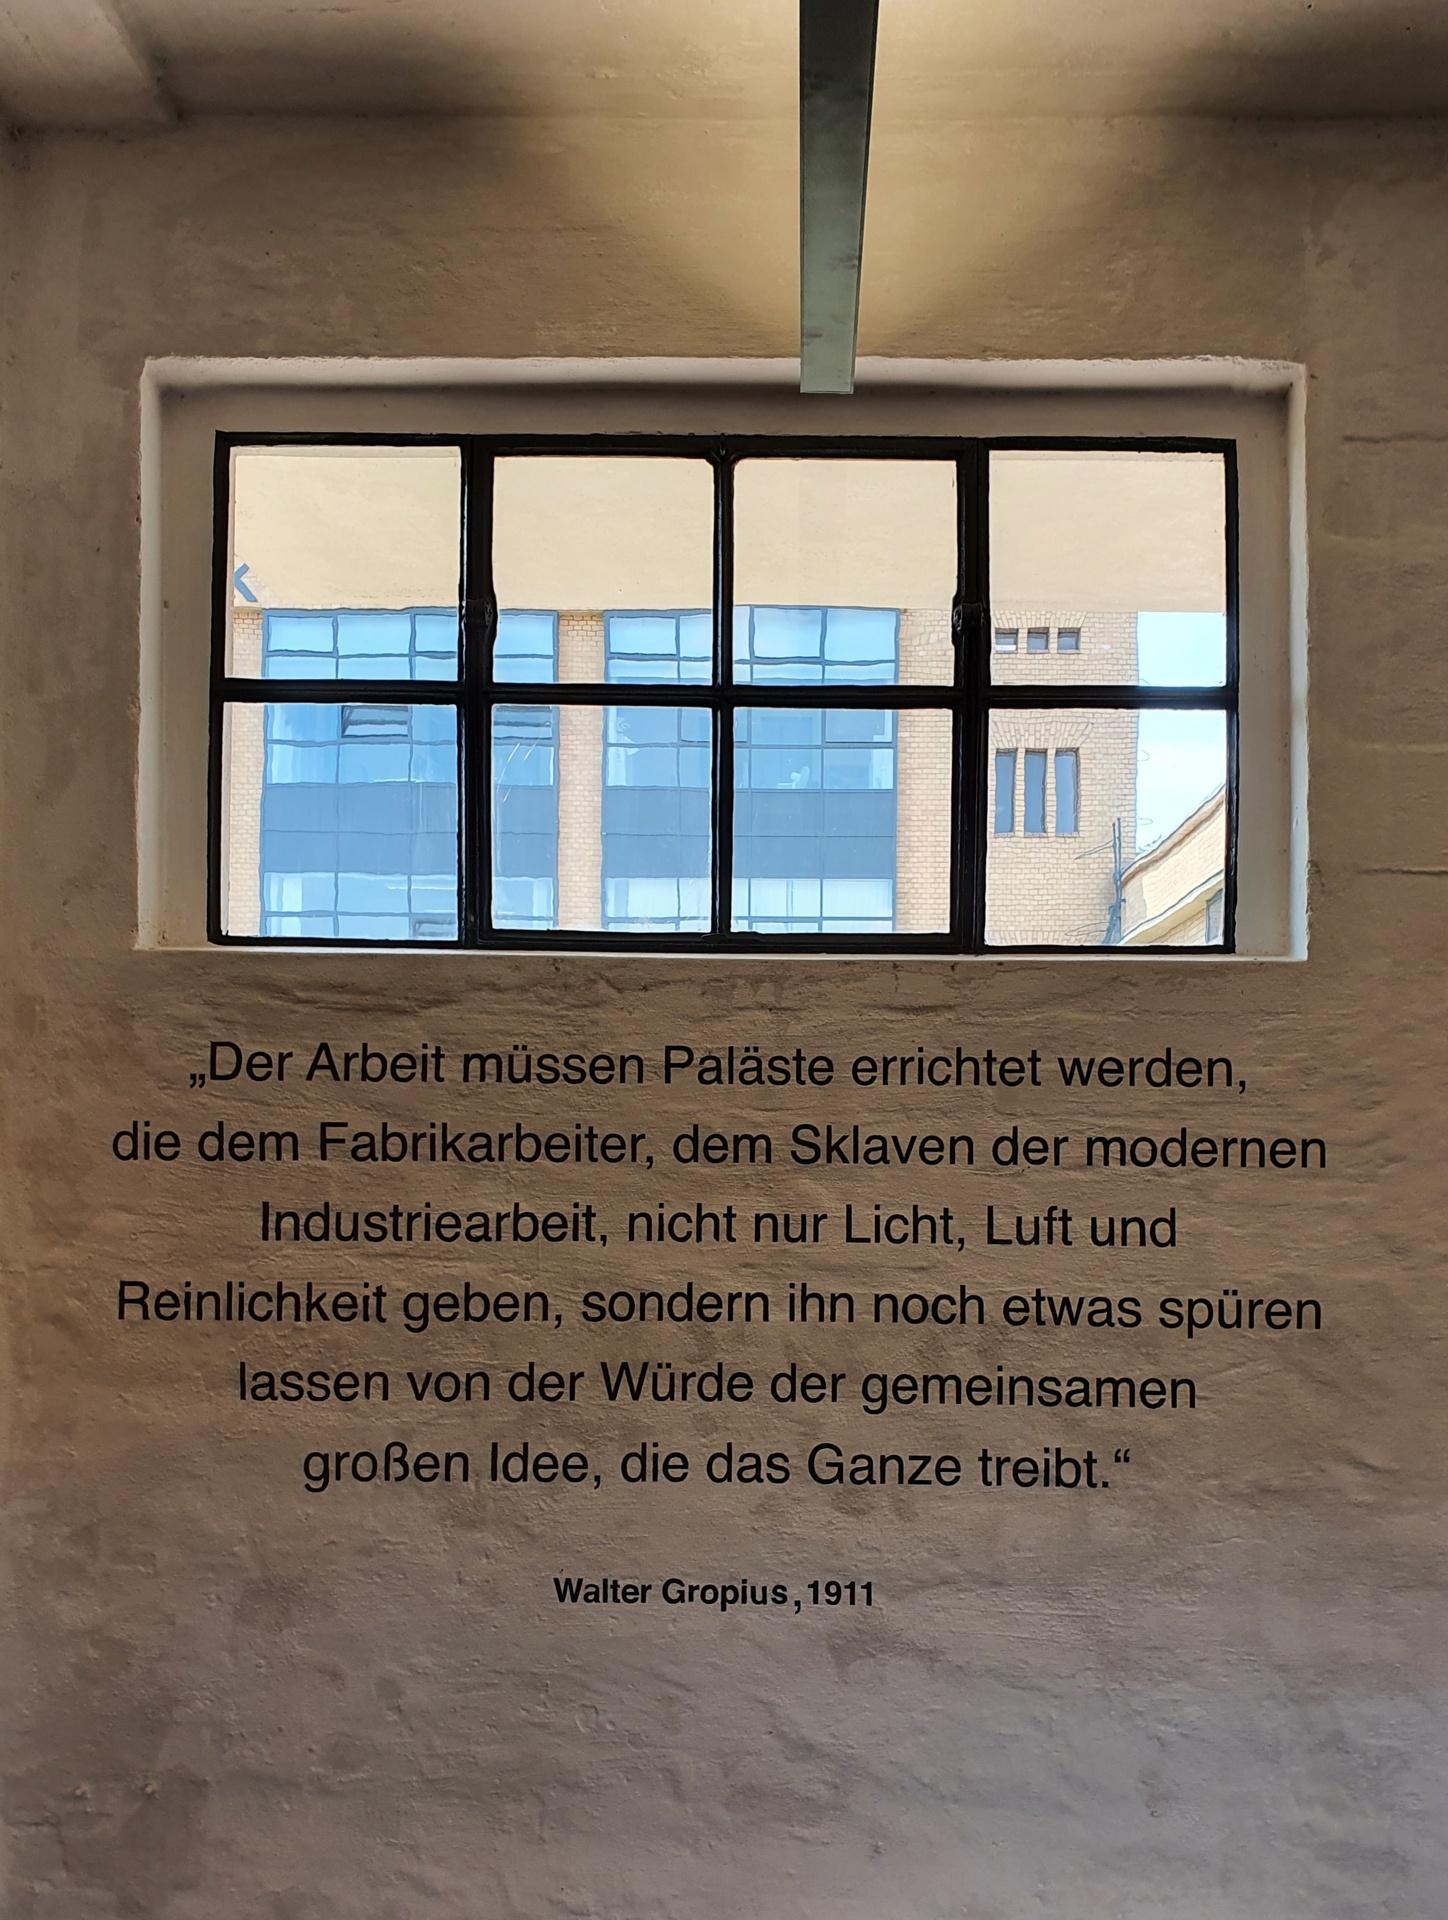 UNESCO Fagus-Werk in Alfeld, Erkenntnis!